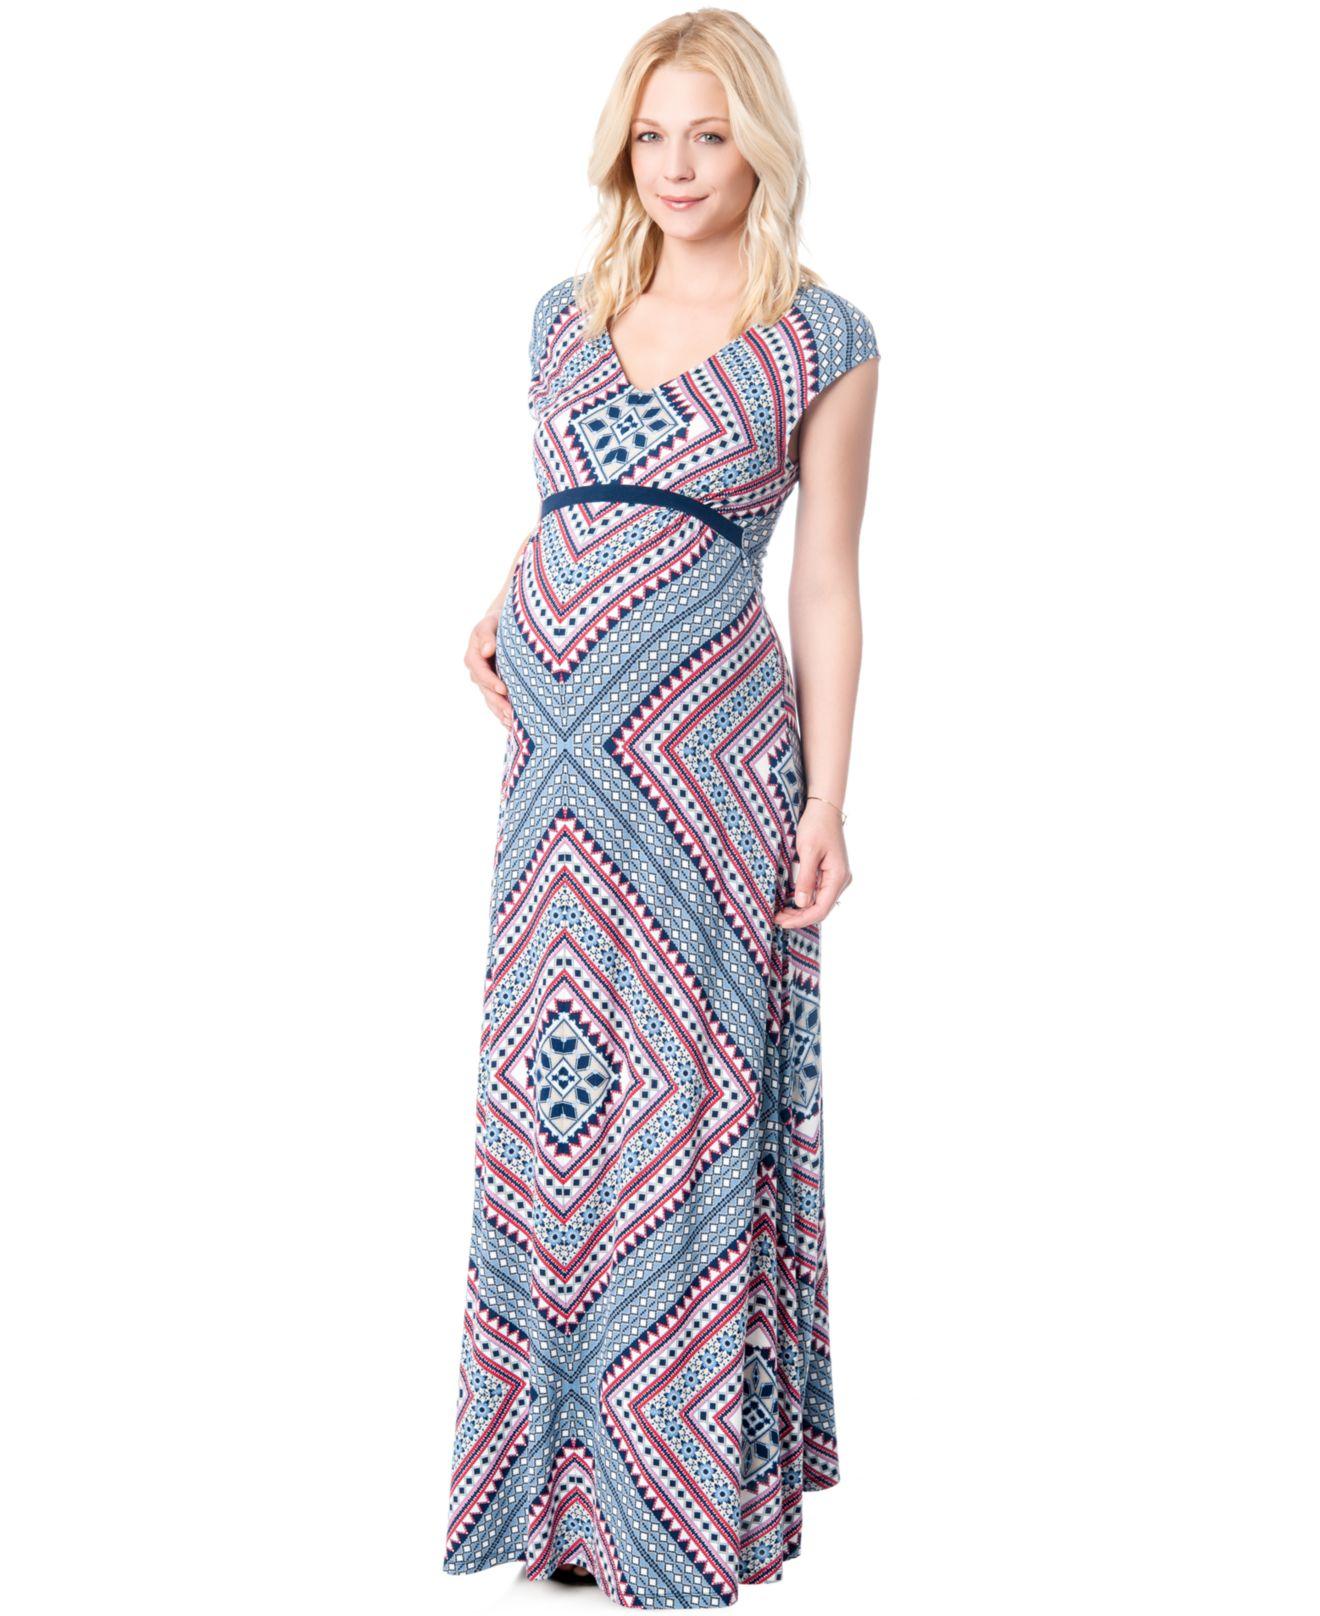 09d1354f6c89e Jessica Simpson Maternity Printed Maxi Dress in Blue - Lyst